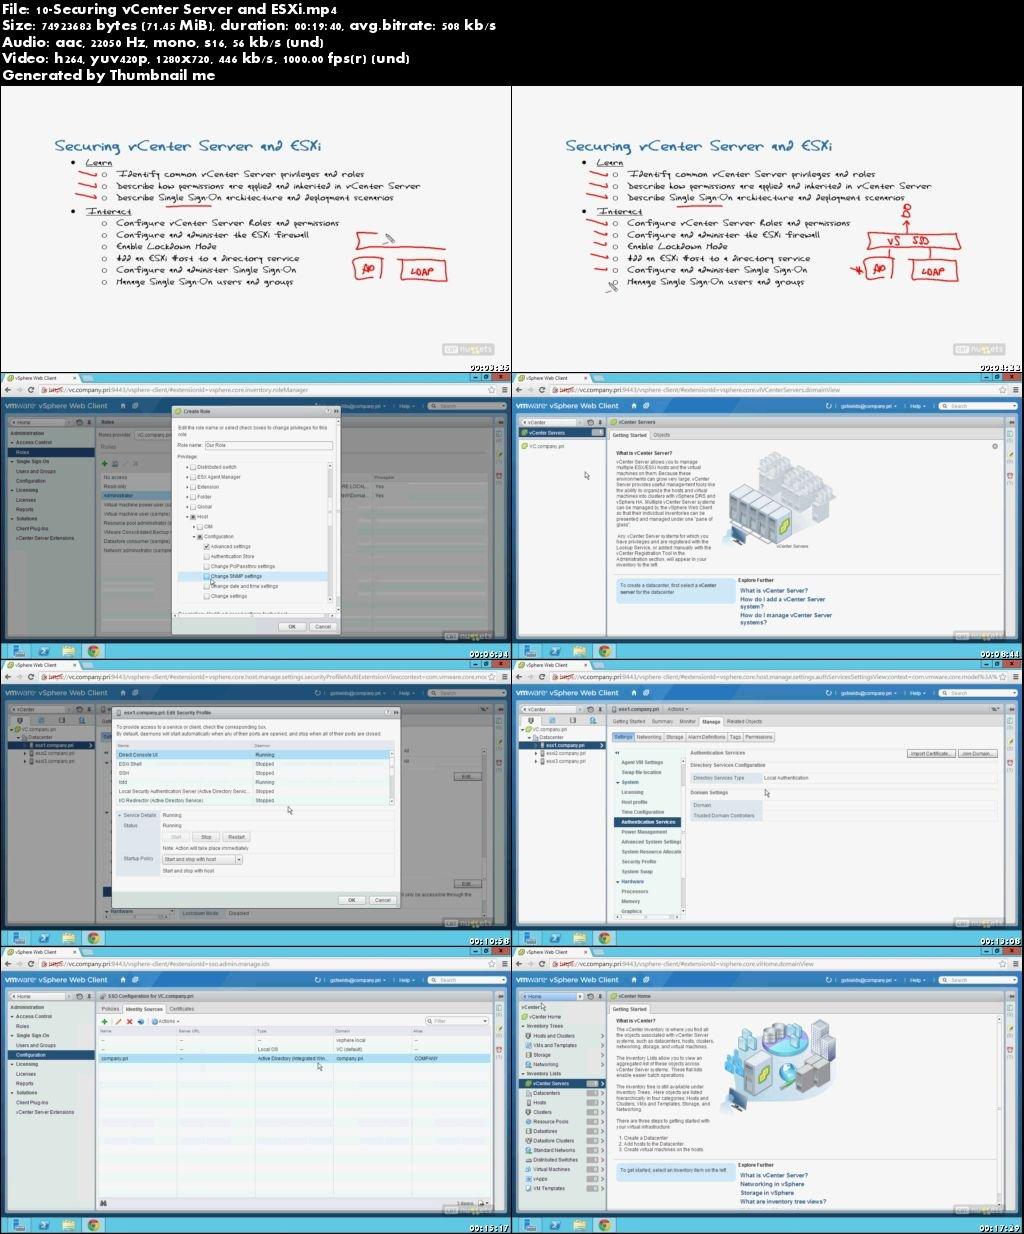 Pass4sure Study Guide Pdf - BICSI Exam Study Materials ...